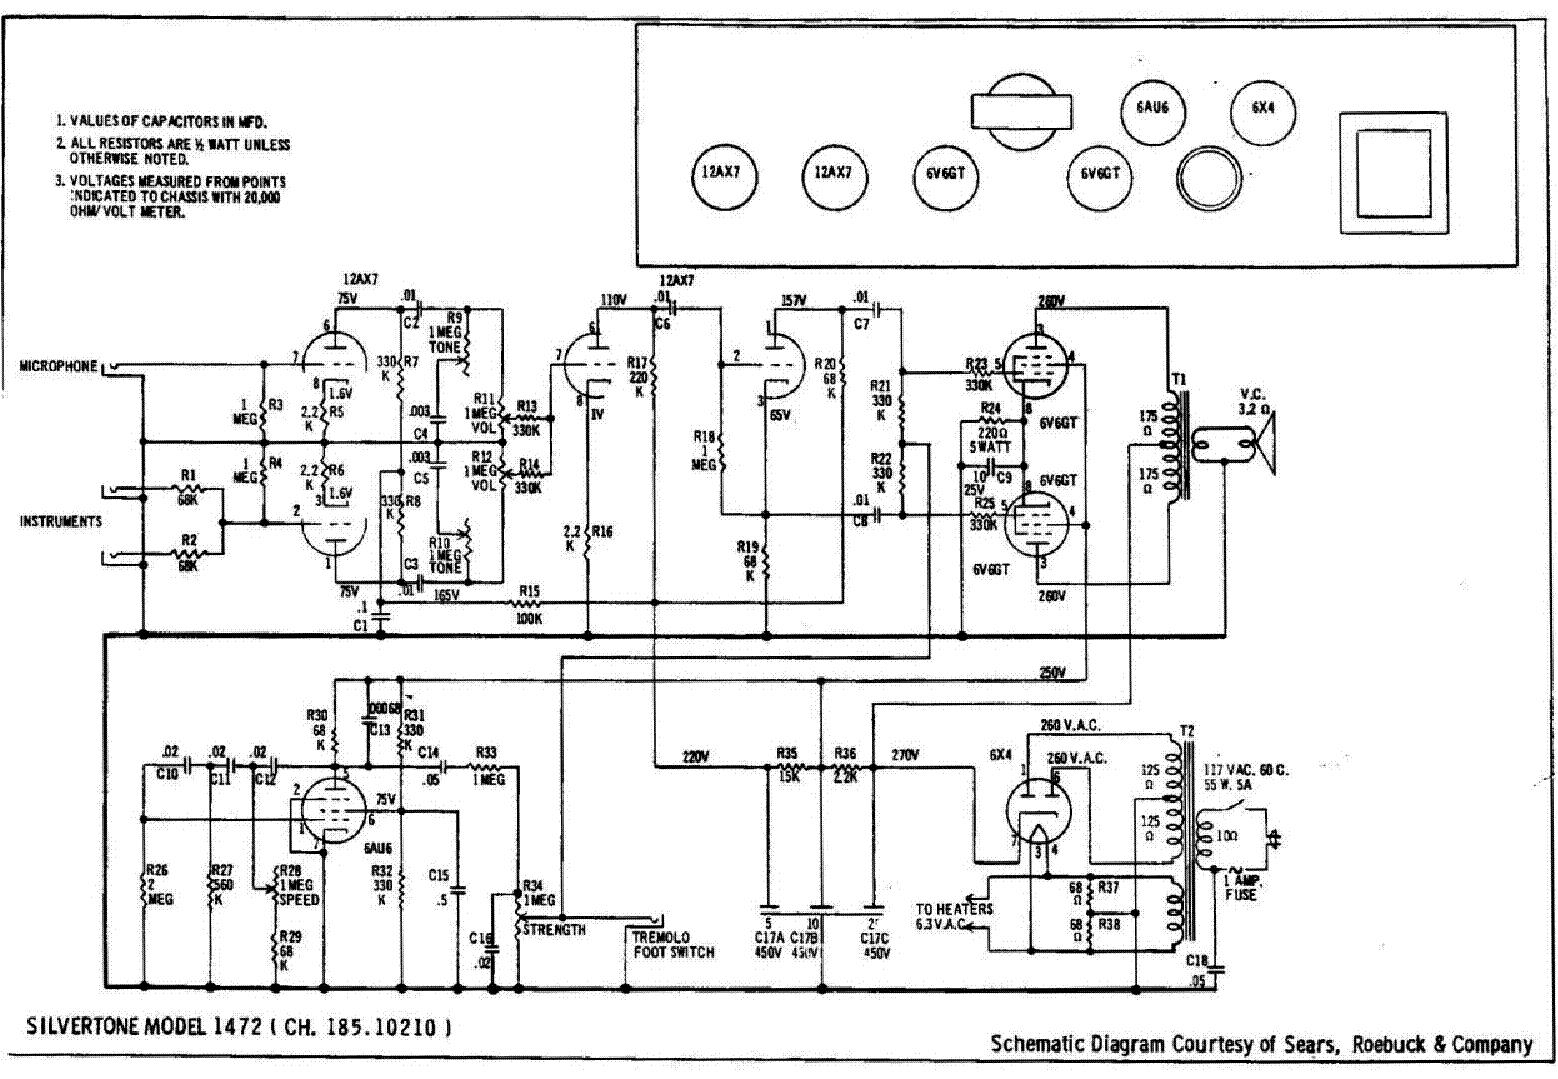 SILVERTONE 1472 service manual (1st page)